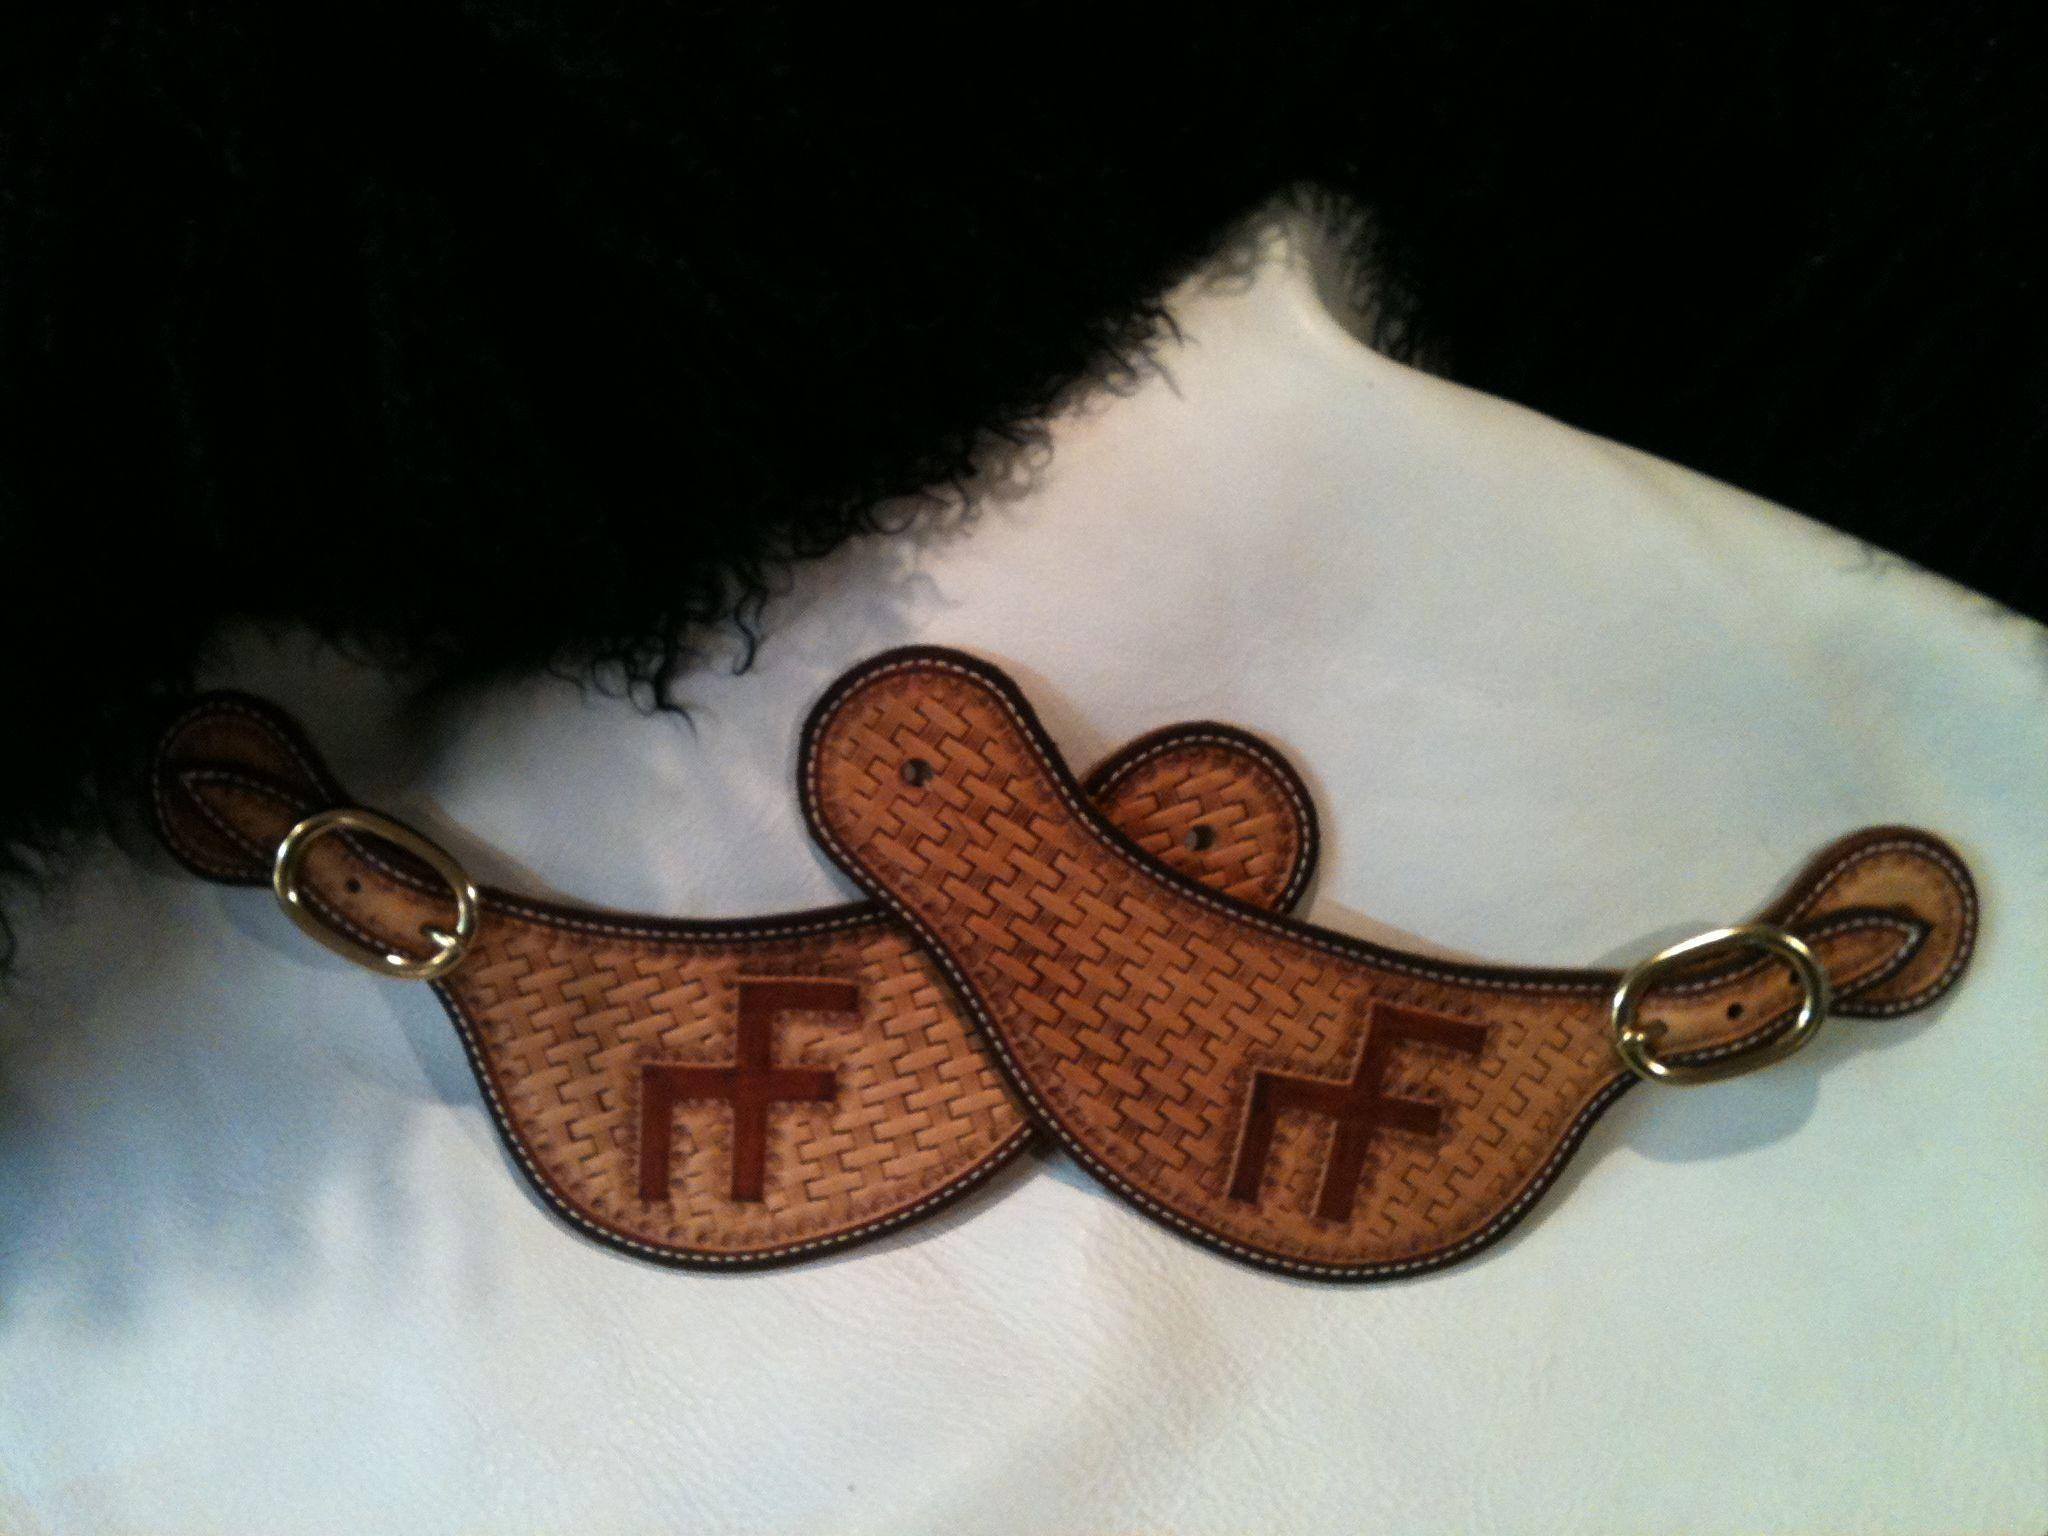 Spur straps made by PRCA Cowboy Larry Sandvick, 12x NFR